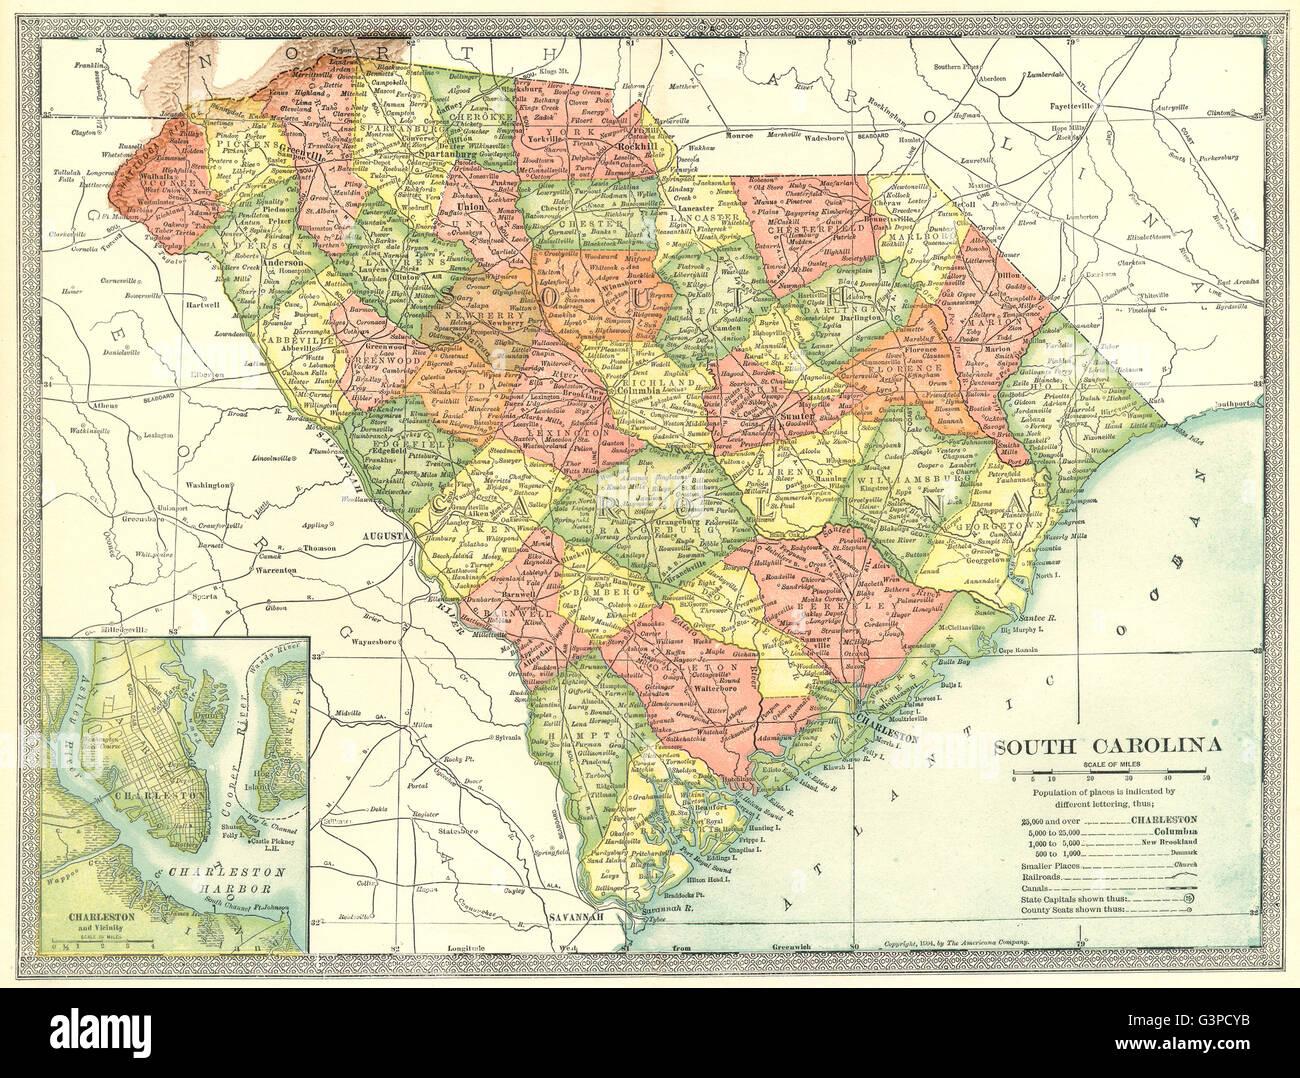 SOUTH CAROLINA state map. Counties. Charleston harbour ...